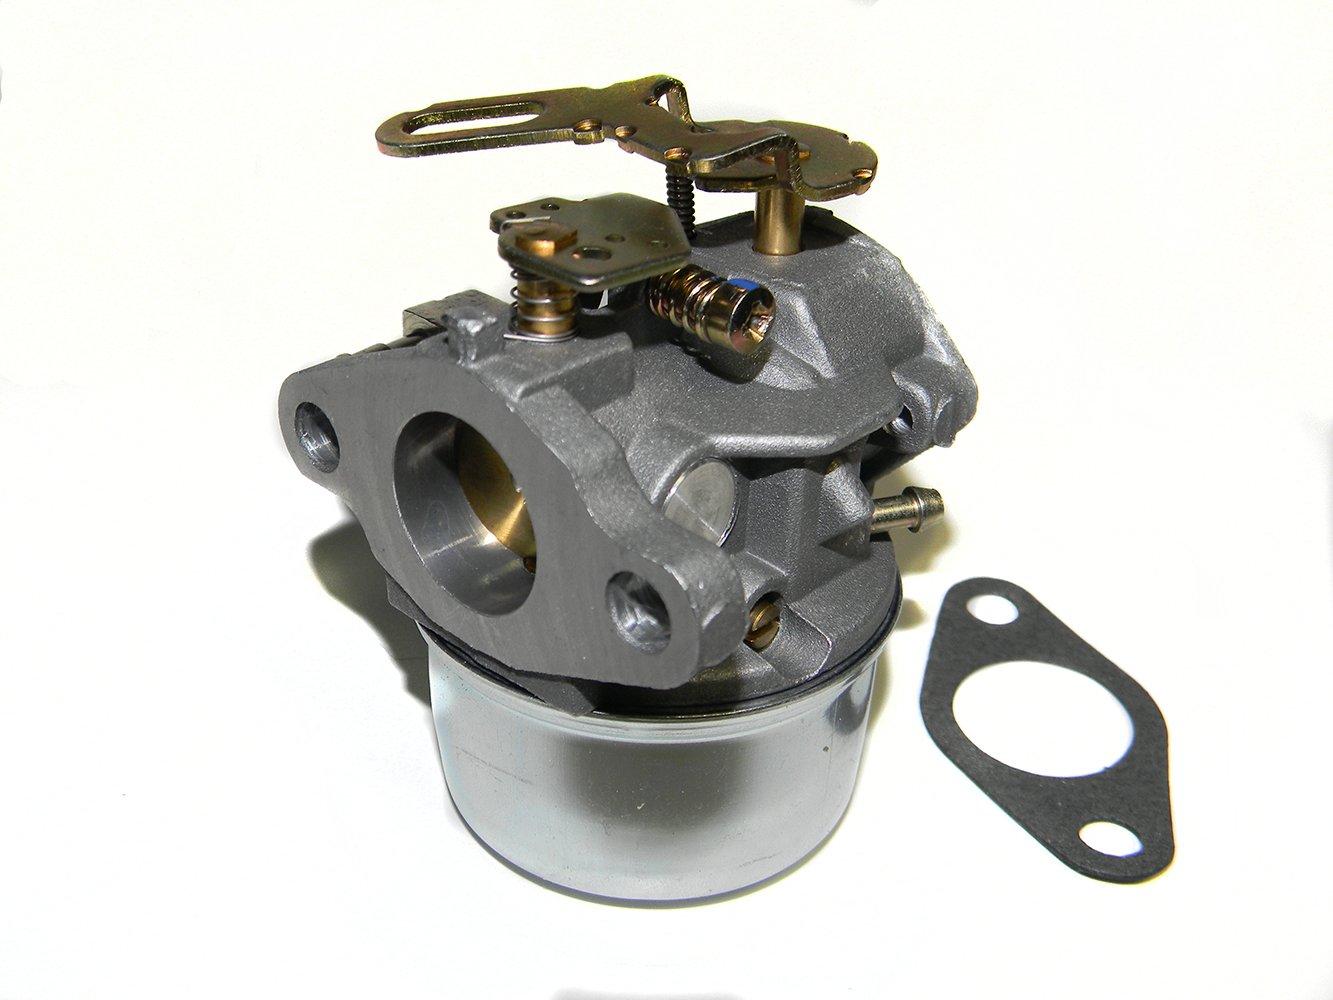 Tecumseh Carburetors 632107A 632107 640084A 640084B fitting HS50-67307J HS50-67307K HS50-67309J Model Engines KINGSTORE